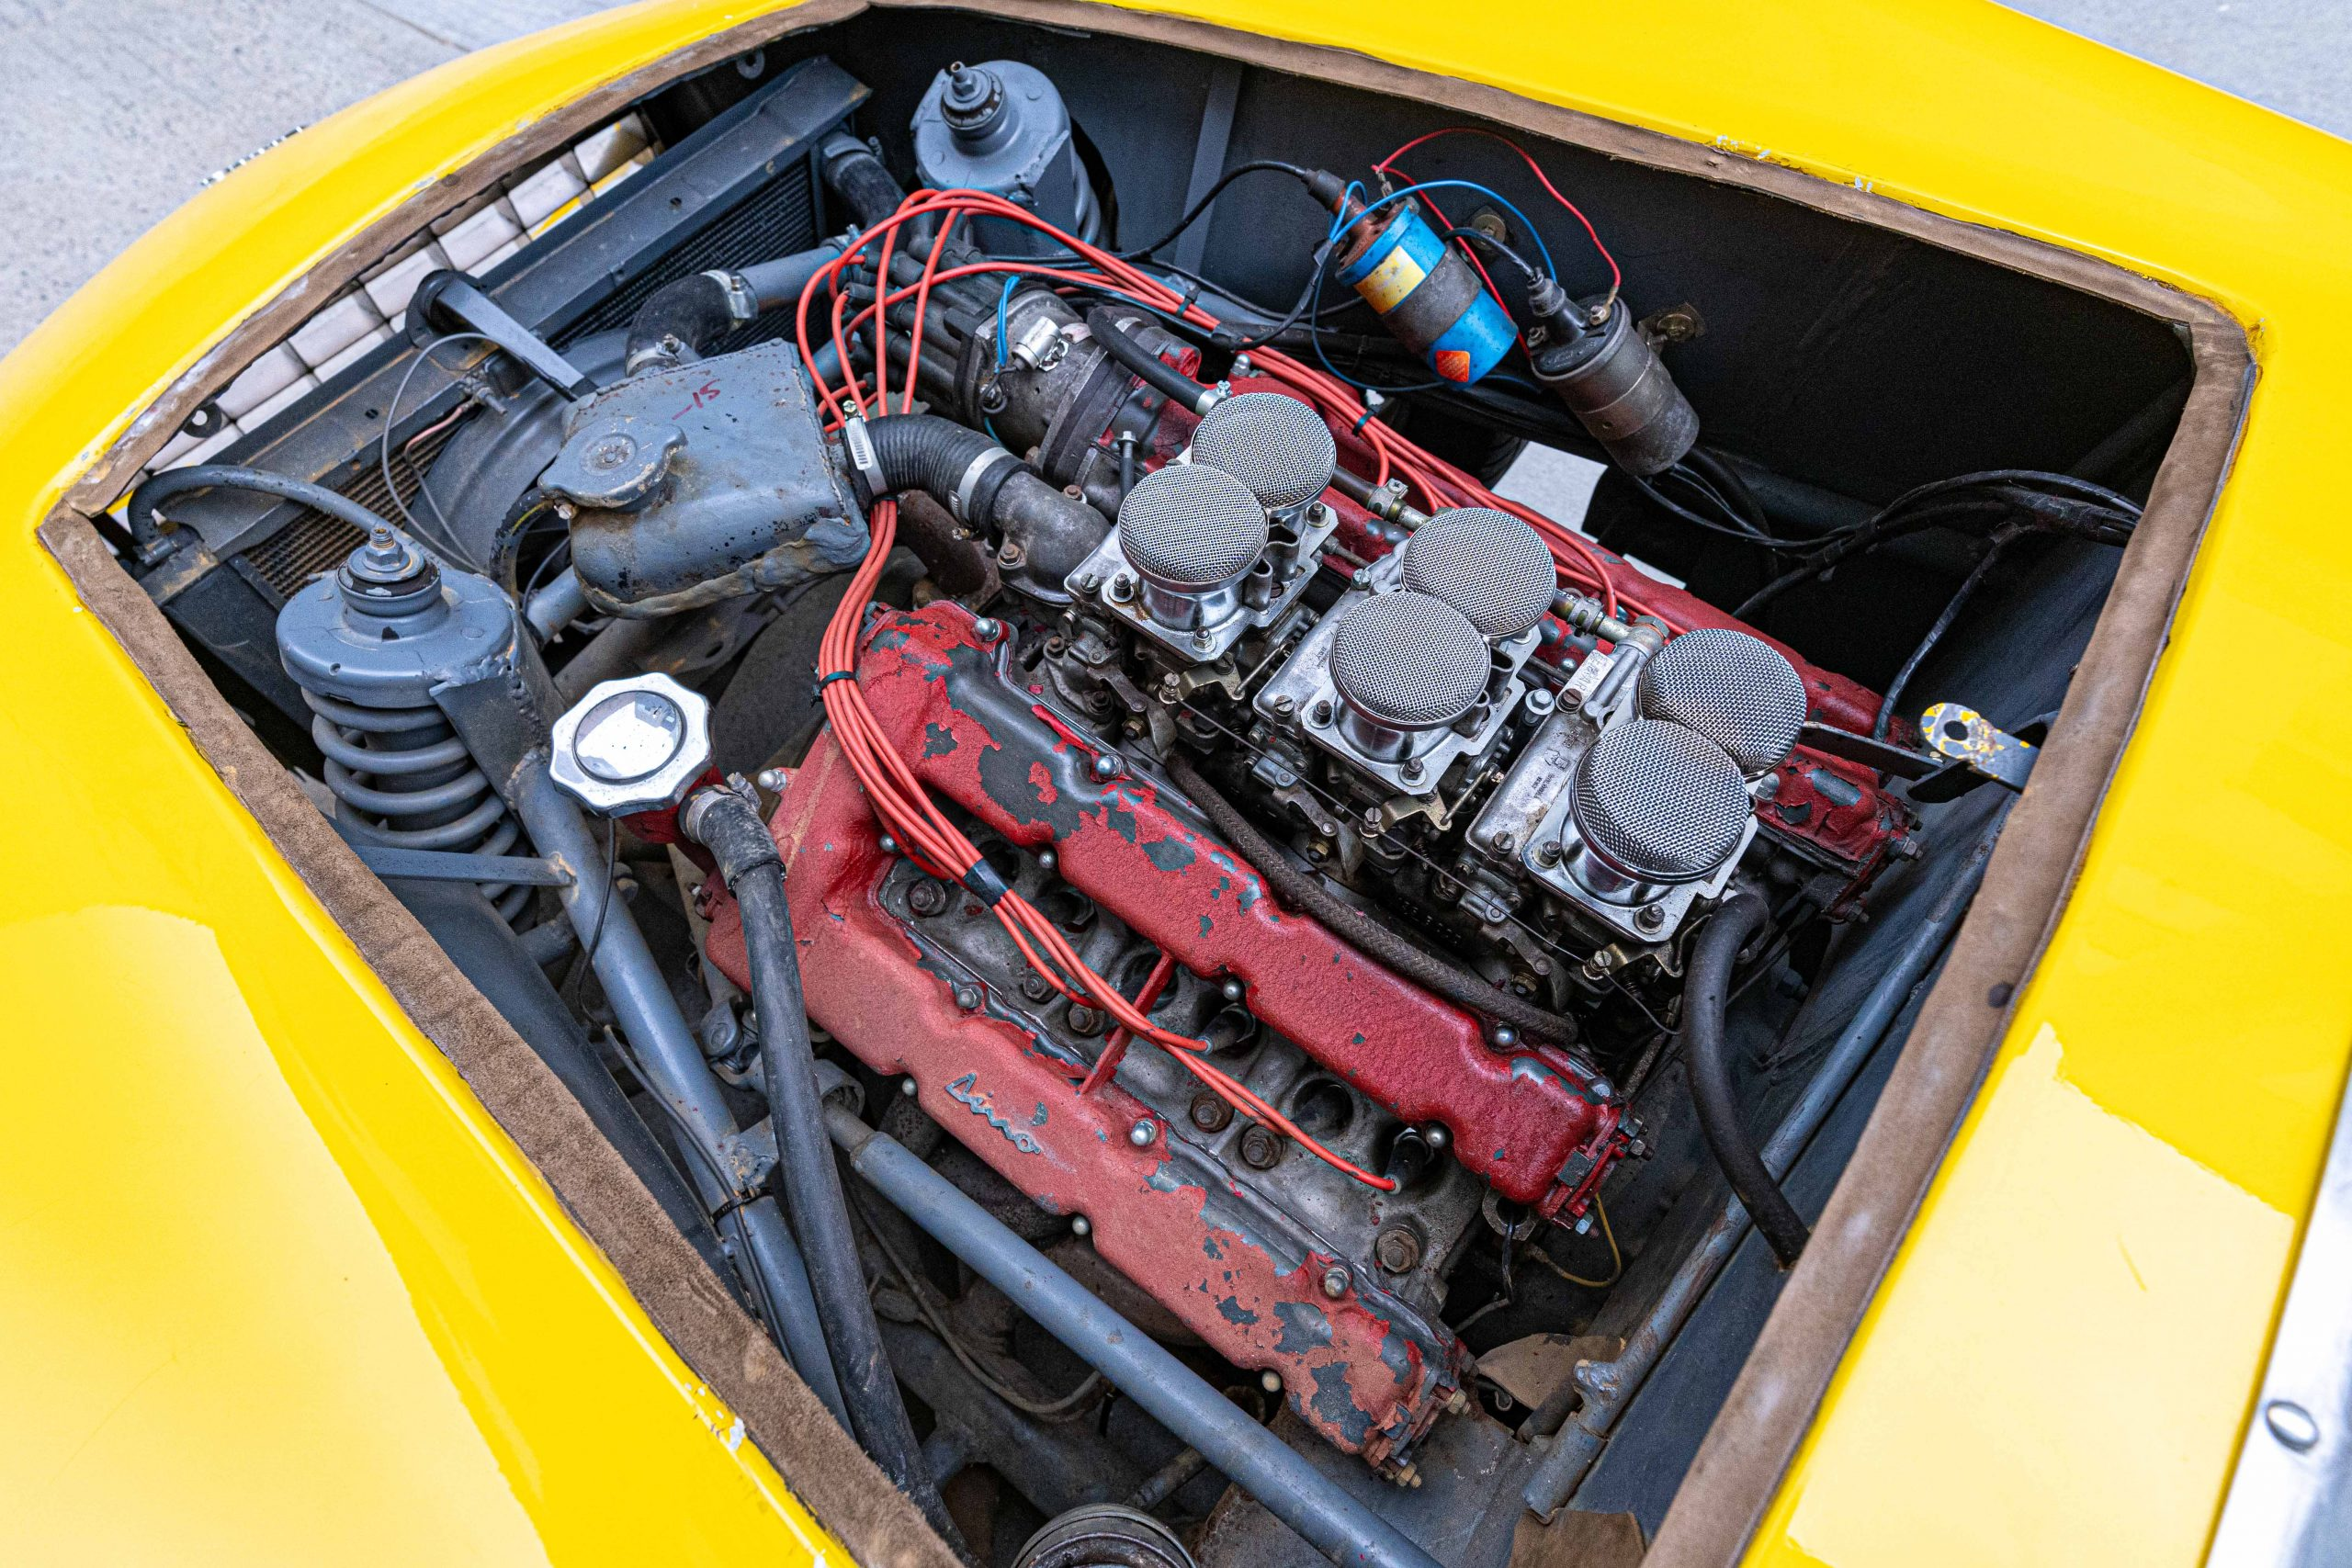 1957 Ferrari 196 SP Engine driver side rear view